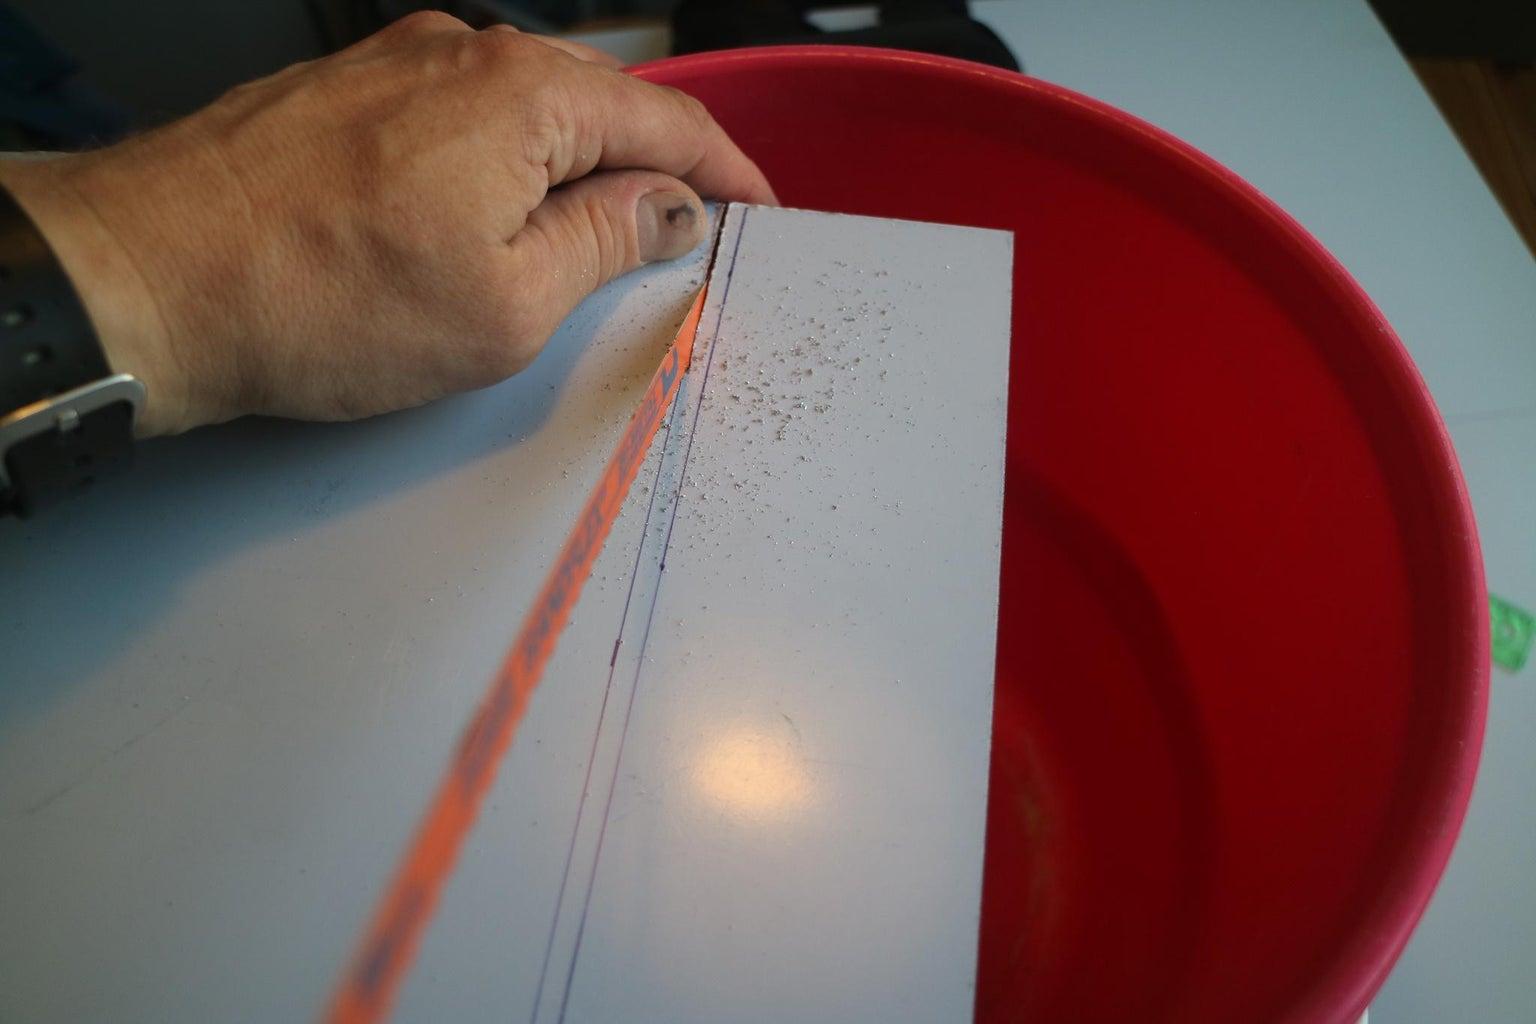 Cut the Sheet